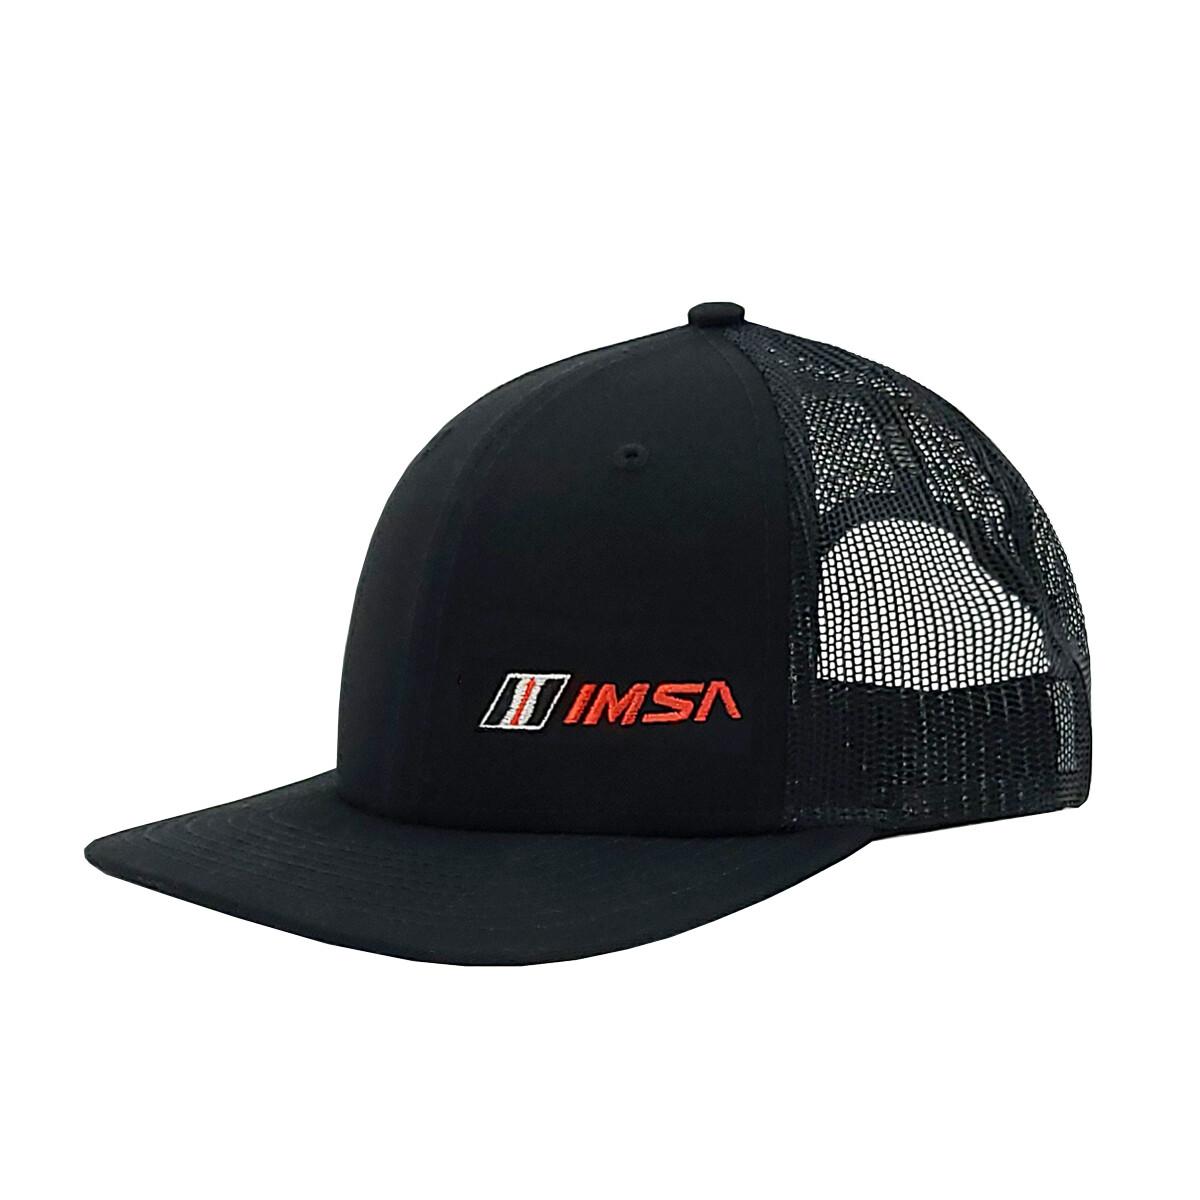 IMSA Flat Bill Hat Left Panel Logo - Black